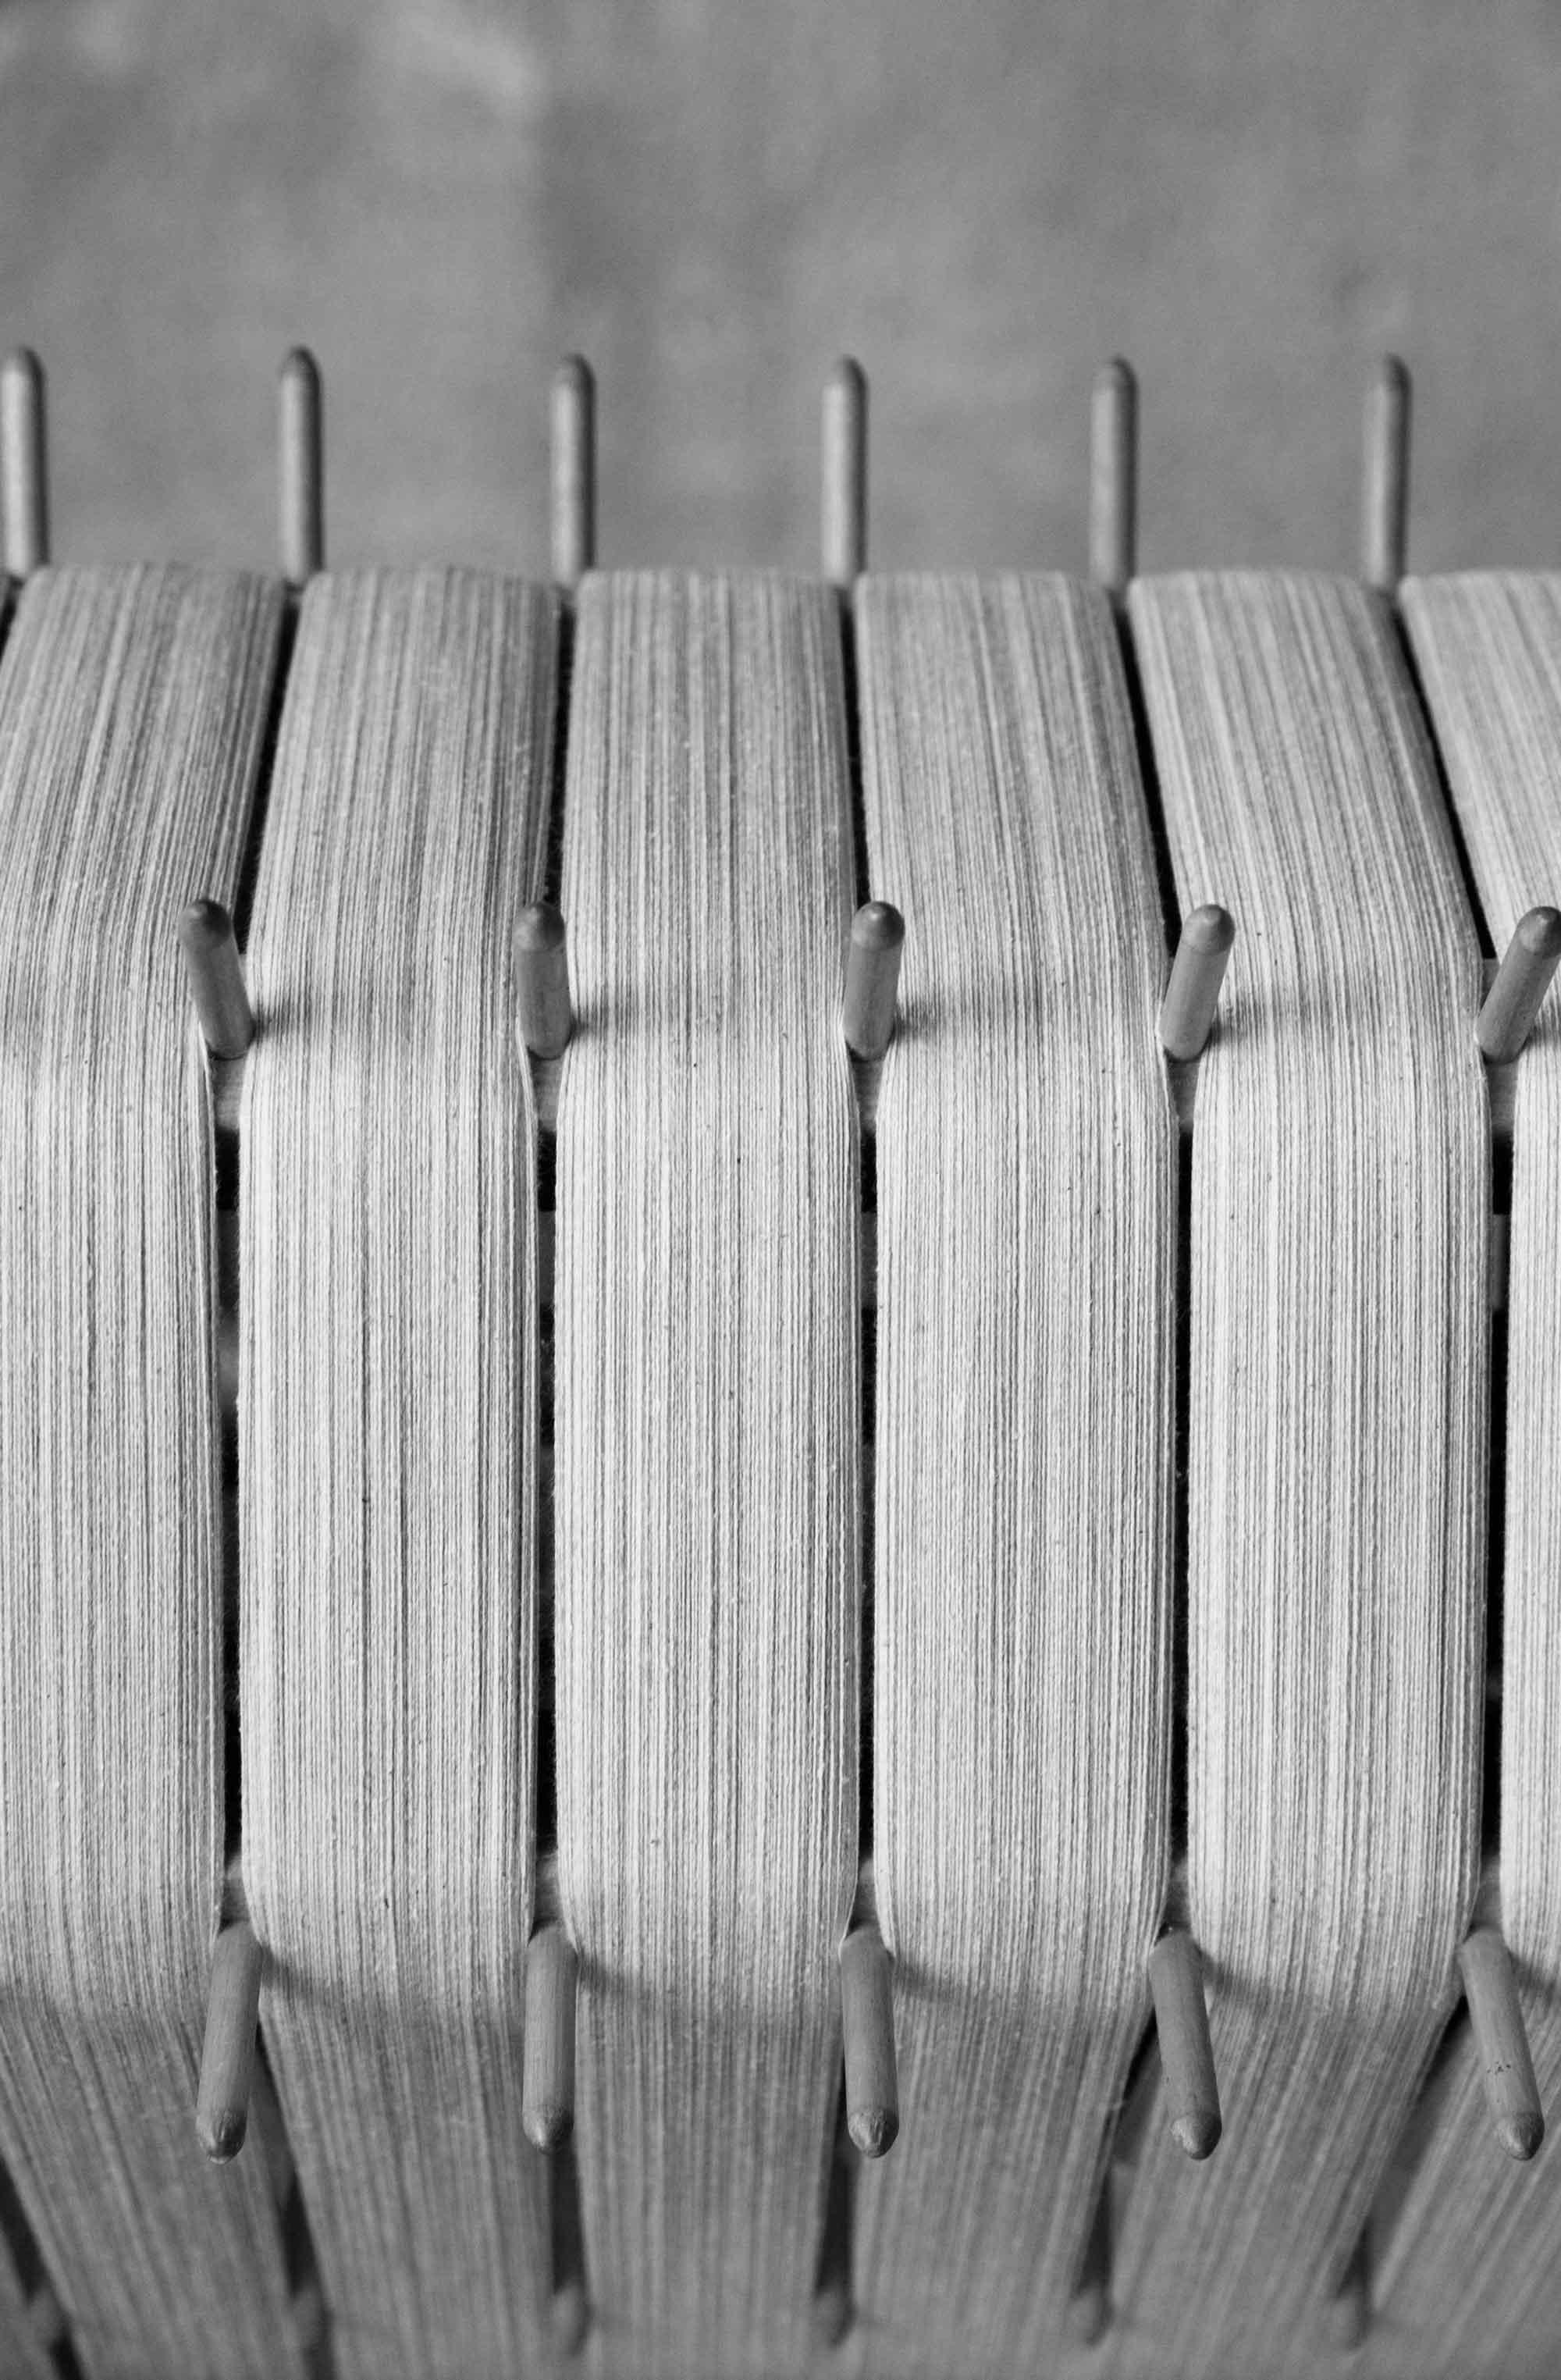 The segmented warping beam dressed to weave 50 yards of cloth.  Nicole Franzen